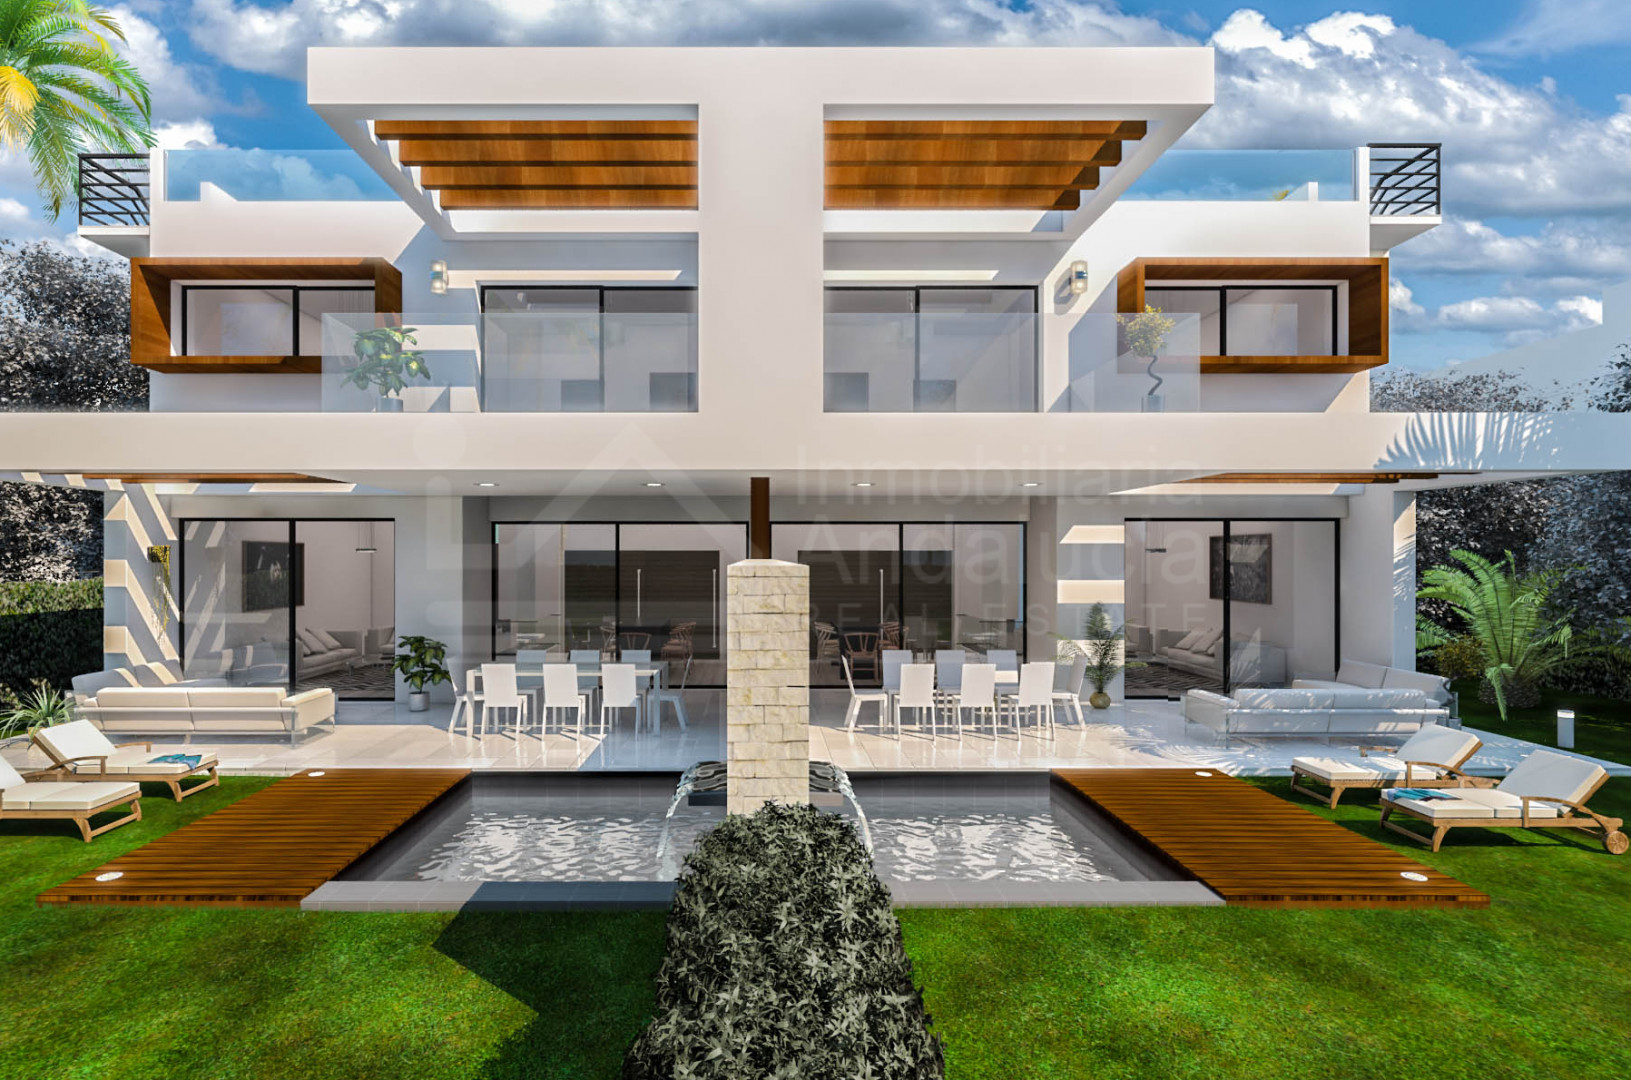 New contemporary style 3-bedroom luxury villa for sale in Estepona